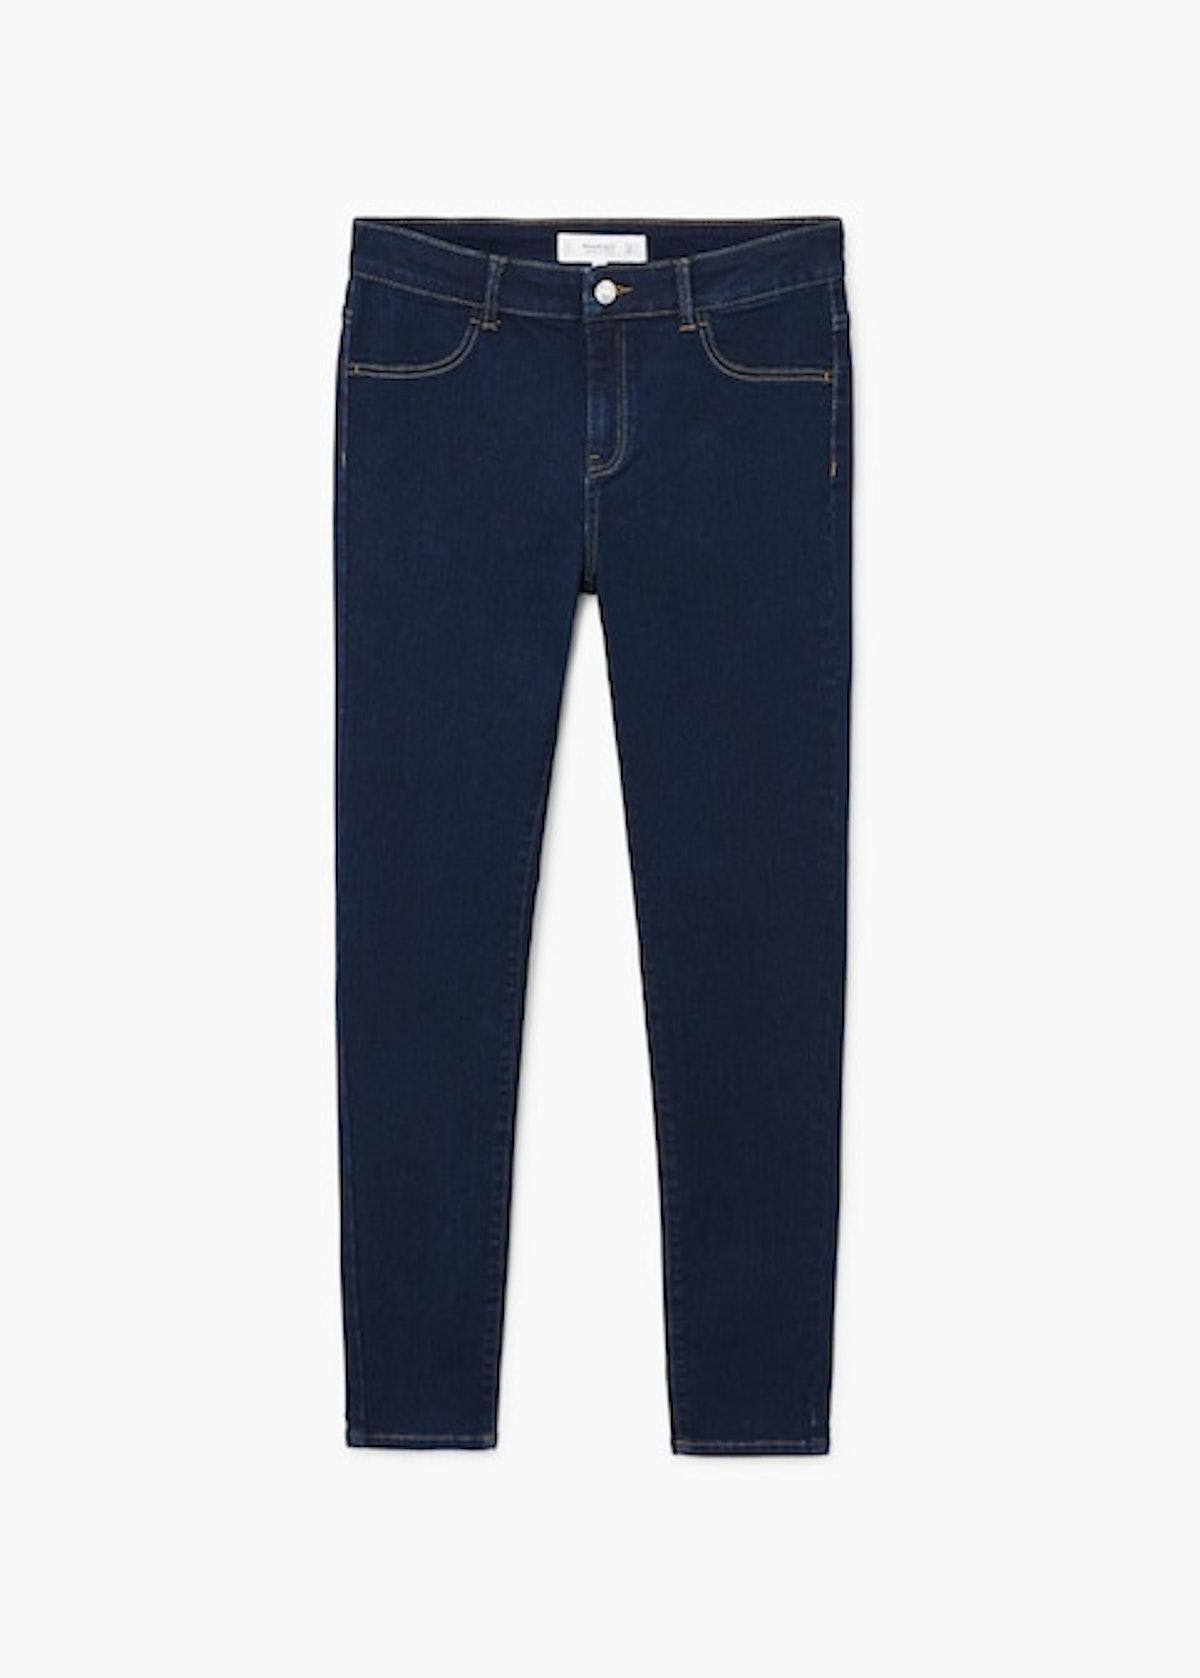 Jane skinny jeans